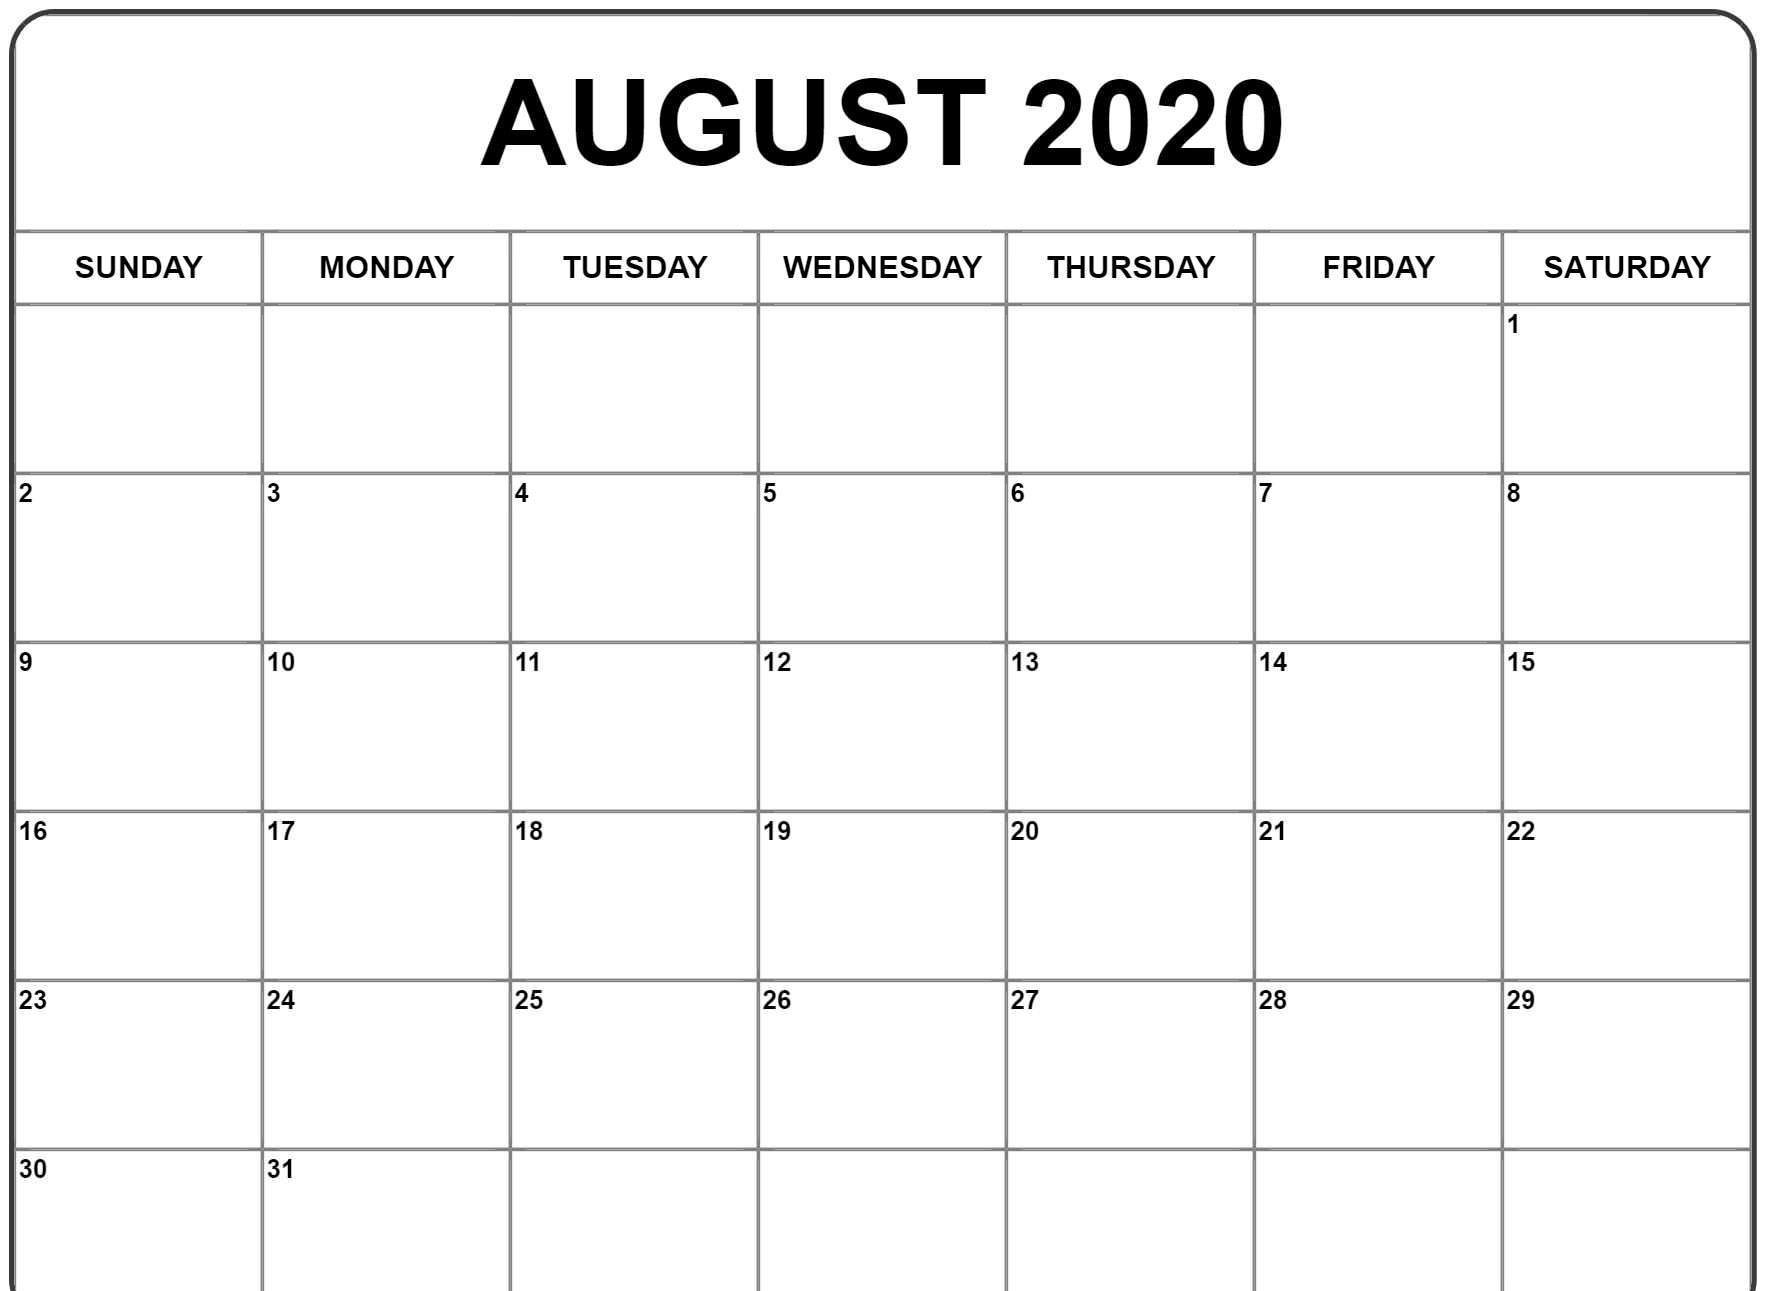 August 2020 Calendar Pdf, Word, Excel Printable Template  2020 Calendar August To December